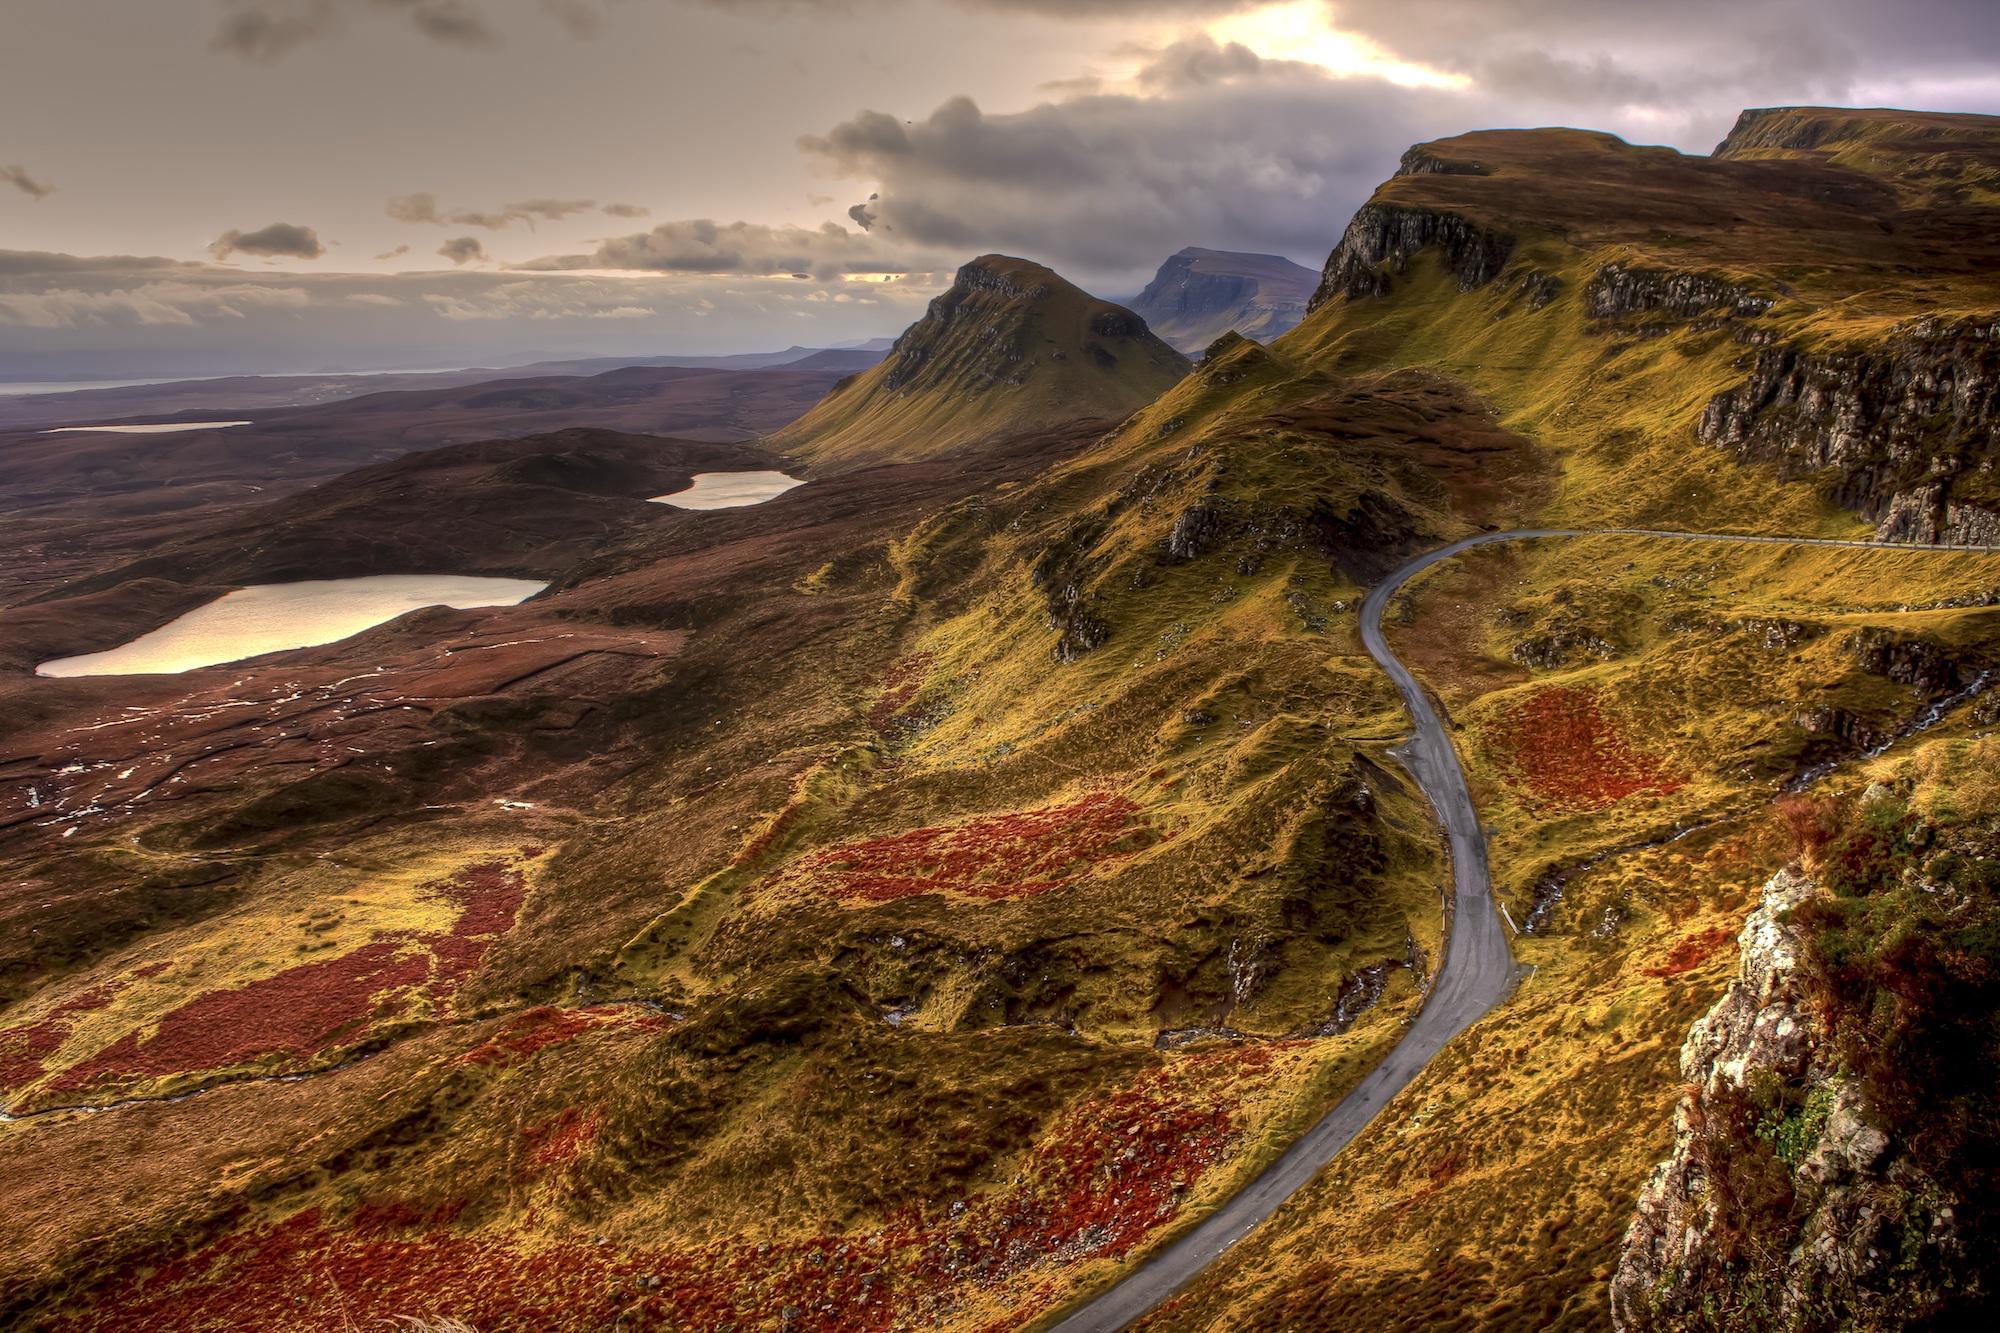 Campervan Hire in Scotland | Motorhome Rental in Scotland